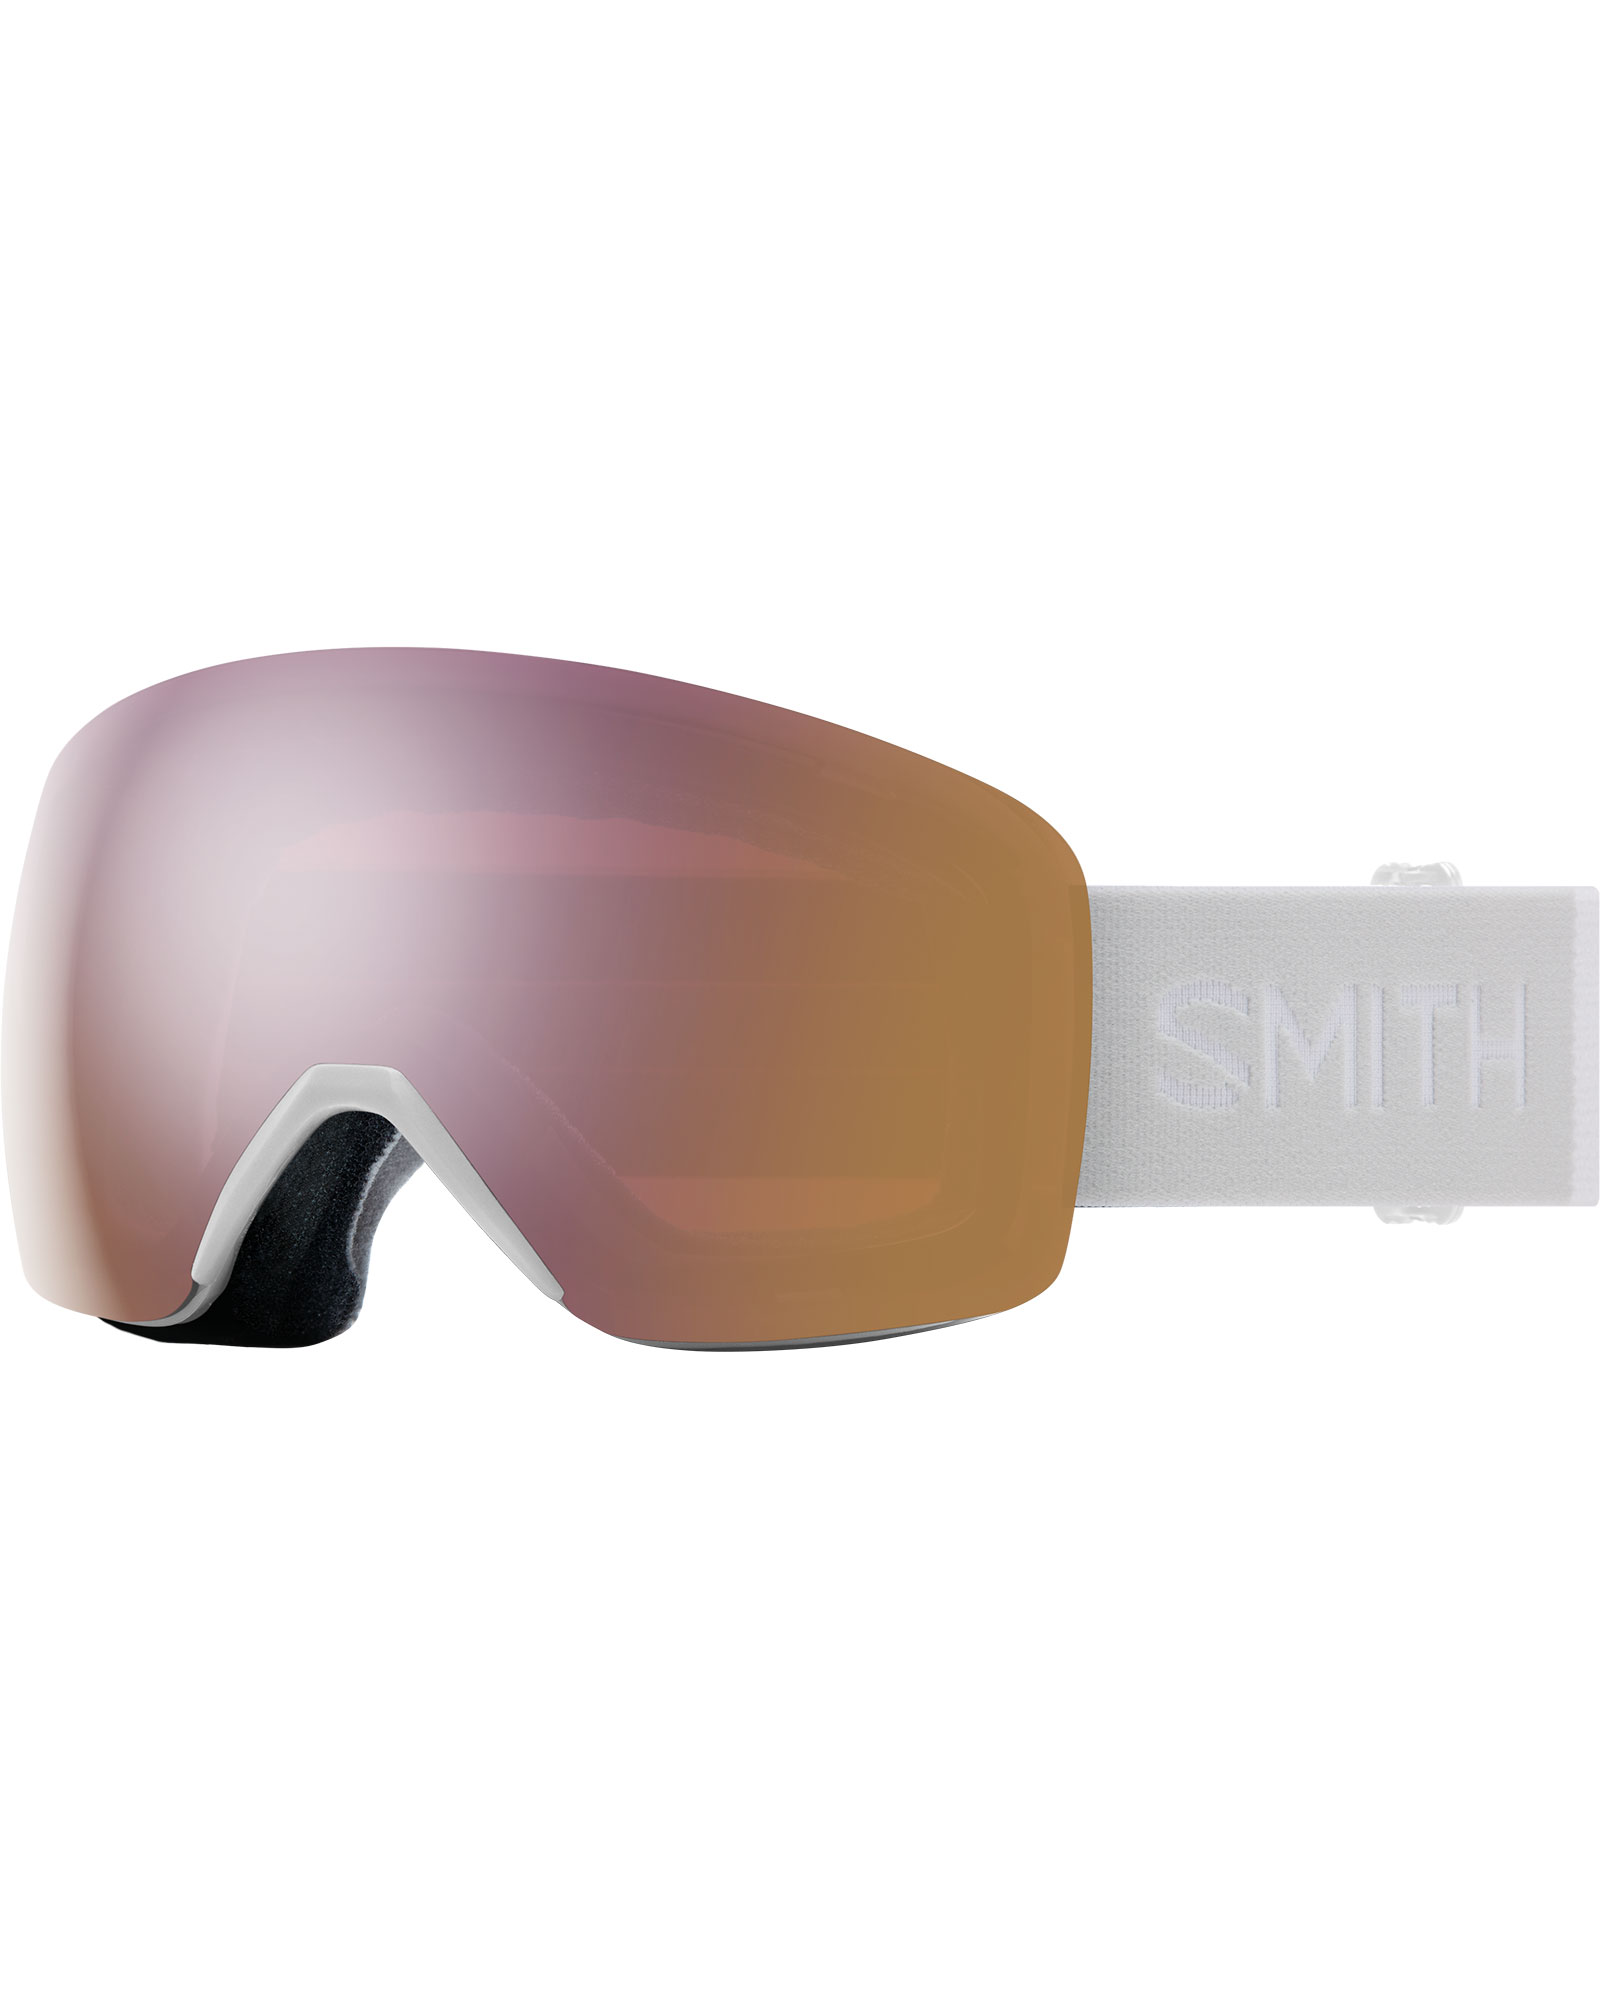 Smith Women's Skyline White Vapor / ChromaPop Everyday Rose Gold Mirror Goggles 2020 / 2021 0